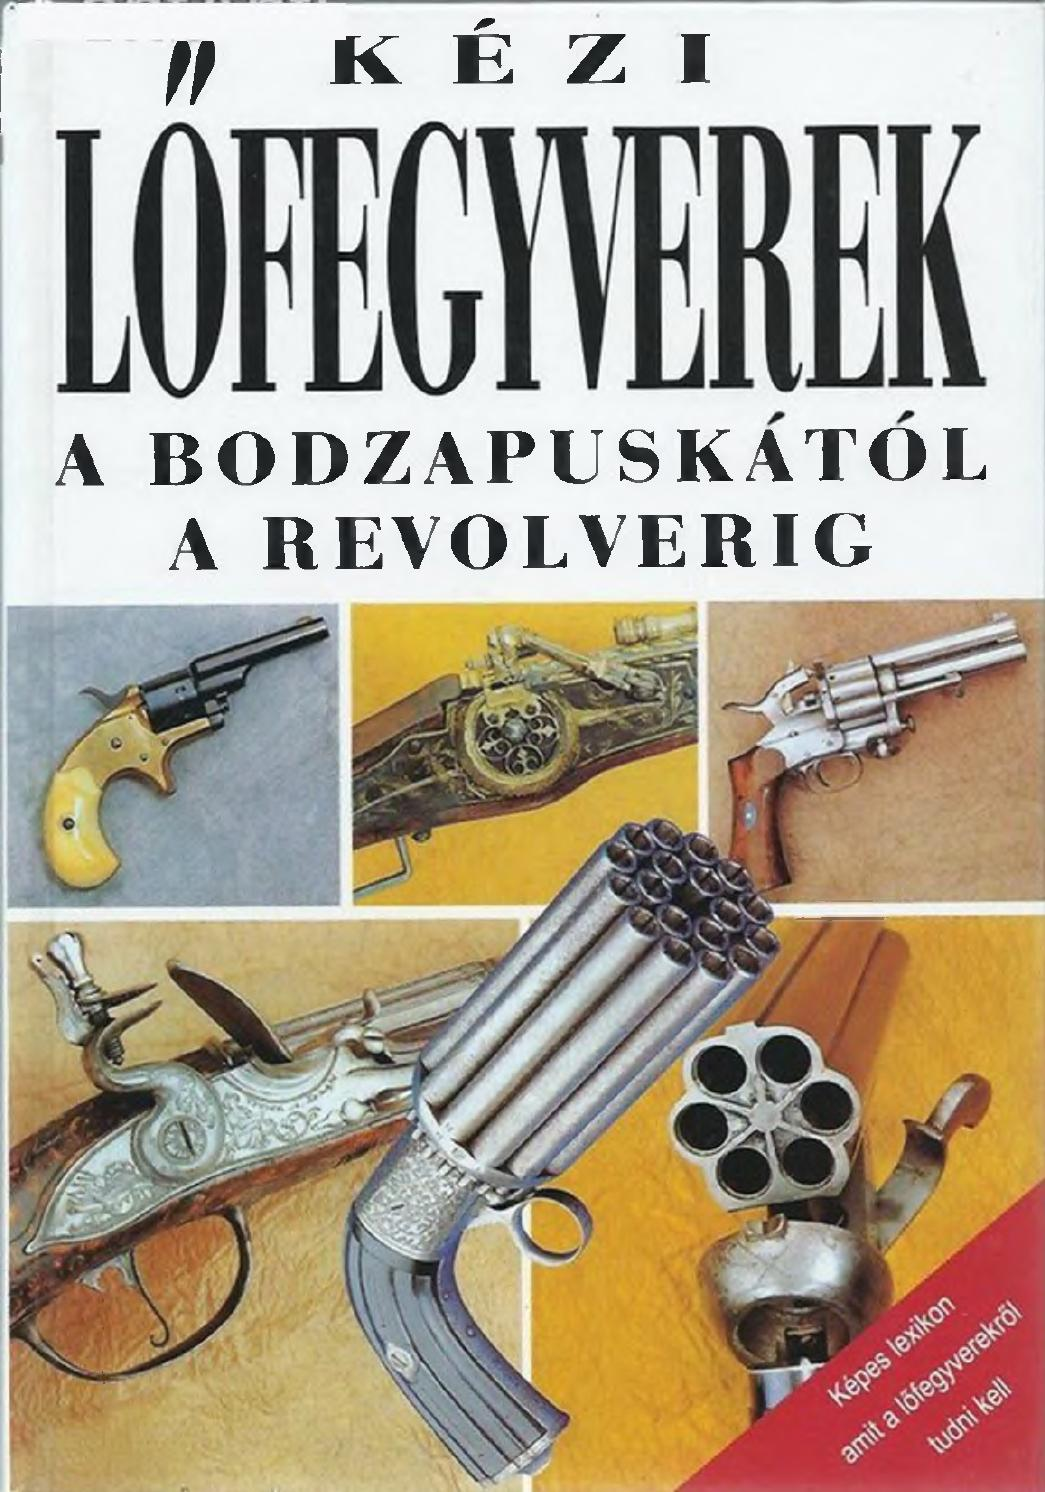 Vladimir dol 237 nek k 233 zi l fegyverek by lajos yossarian issuu